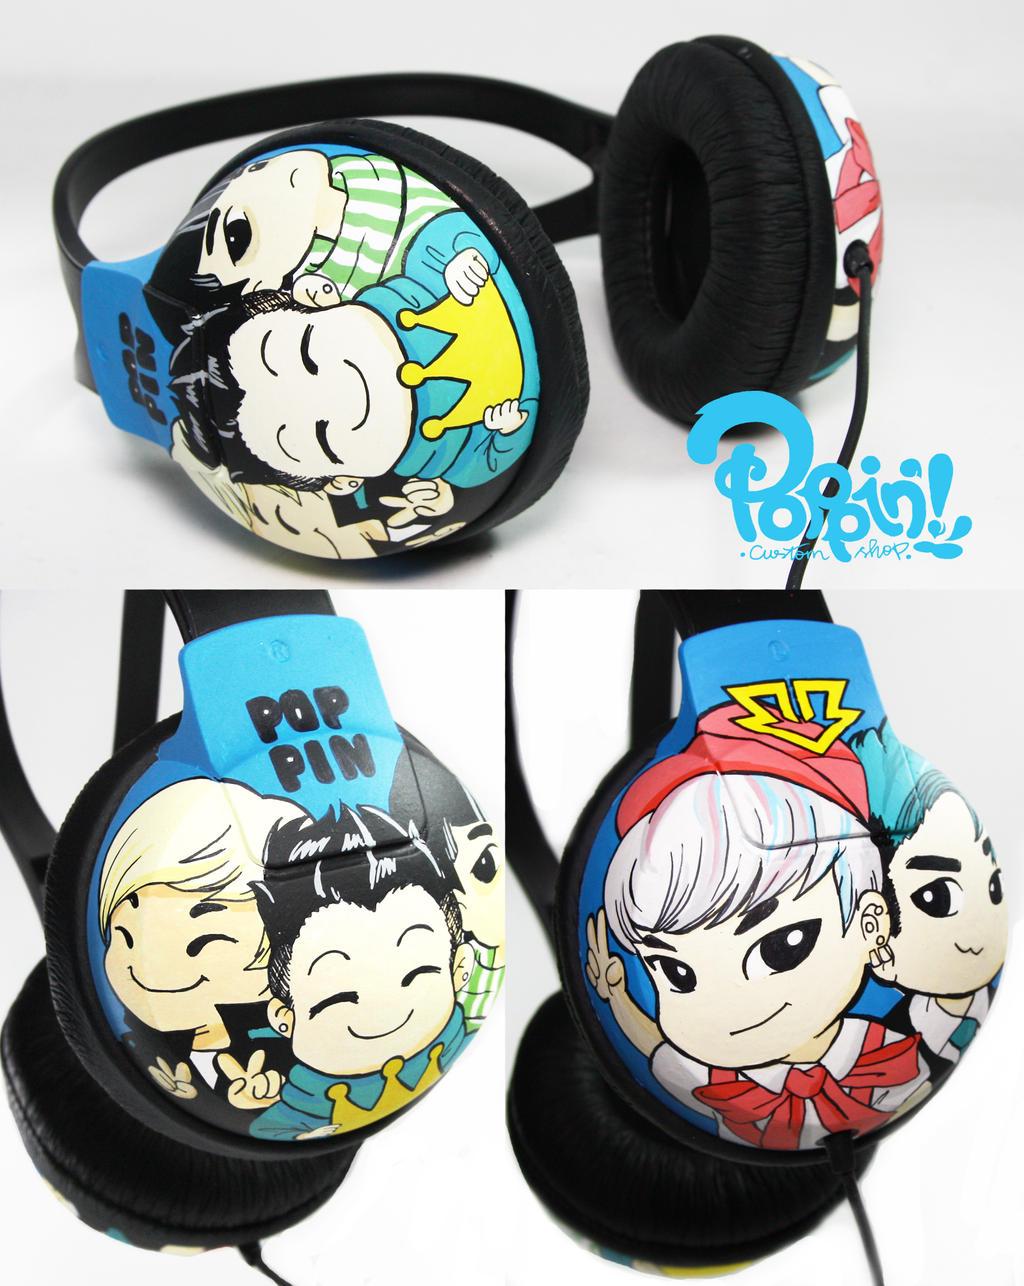 Bigbang Chibi Headphone by PoppinCustomArt